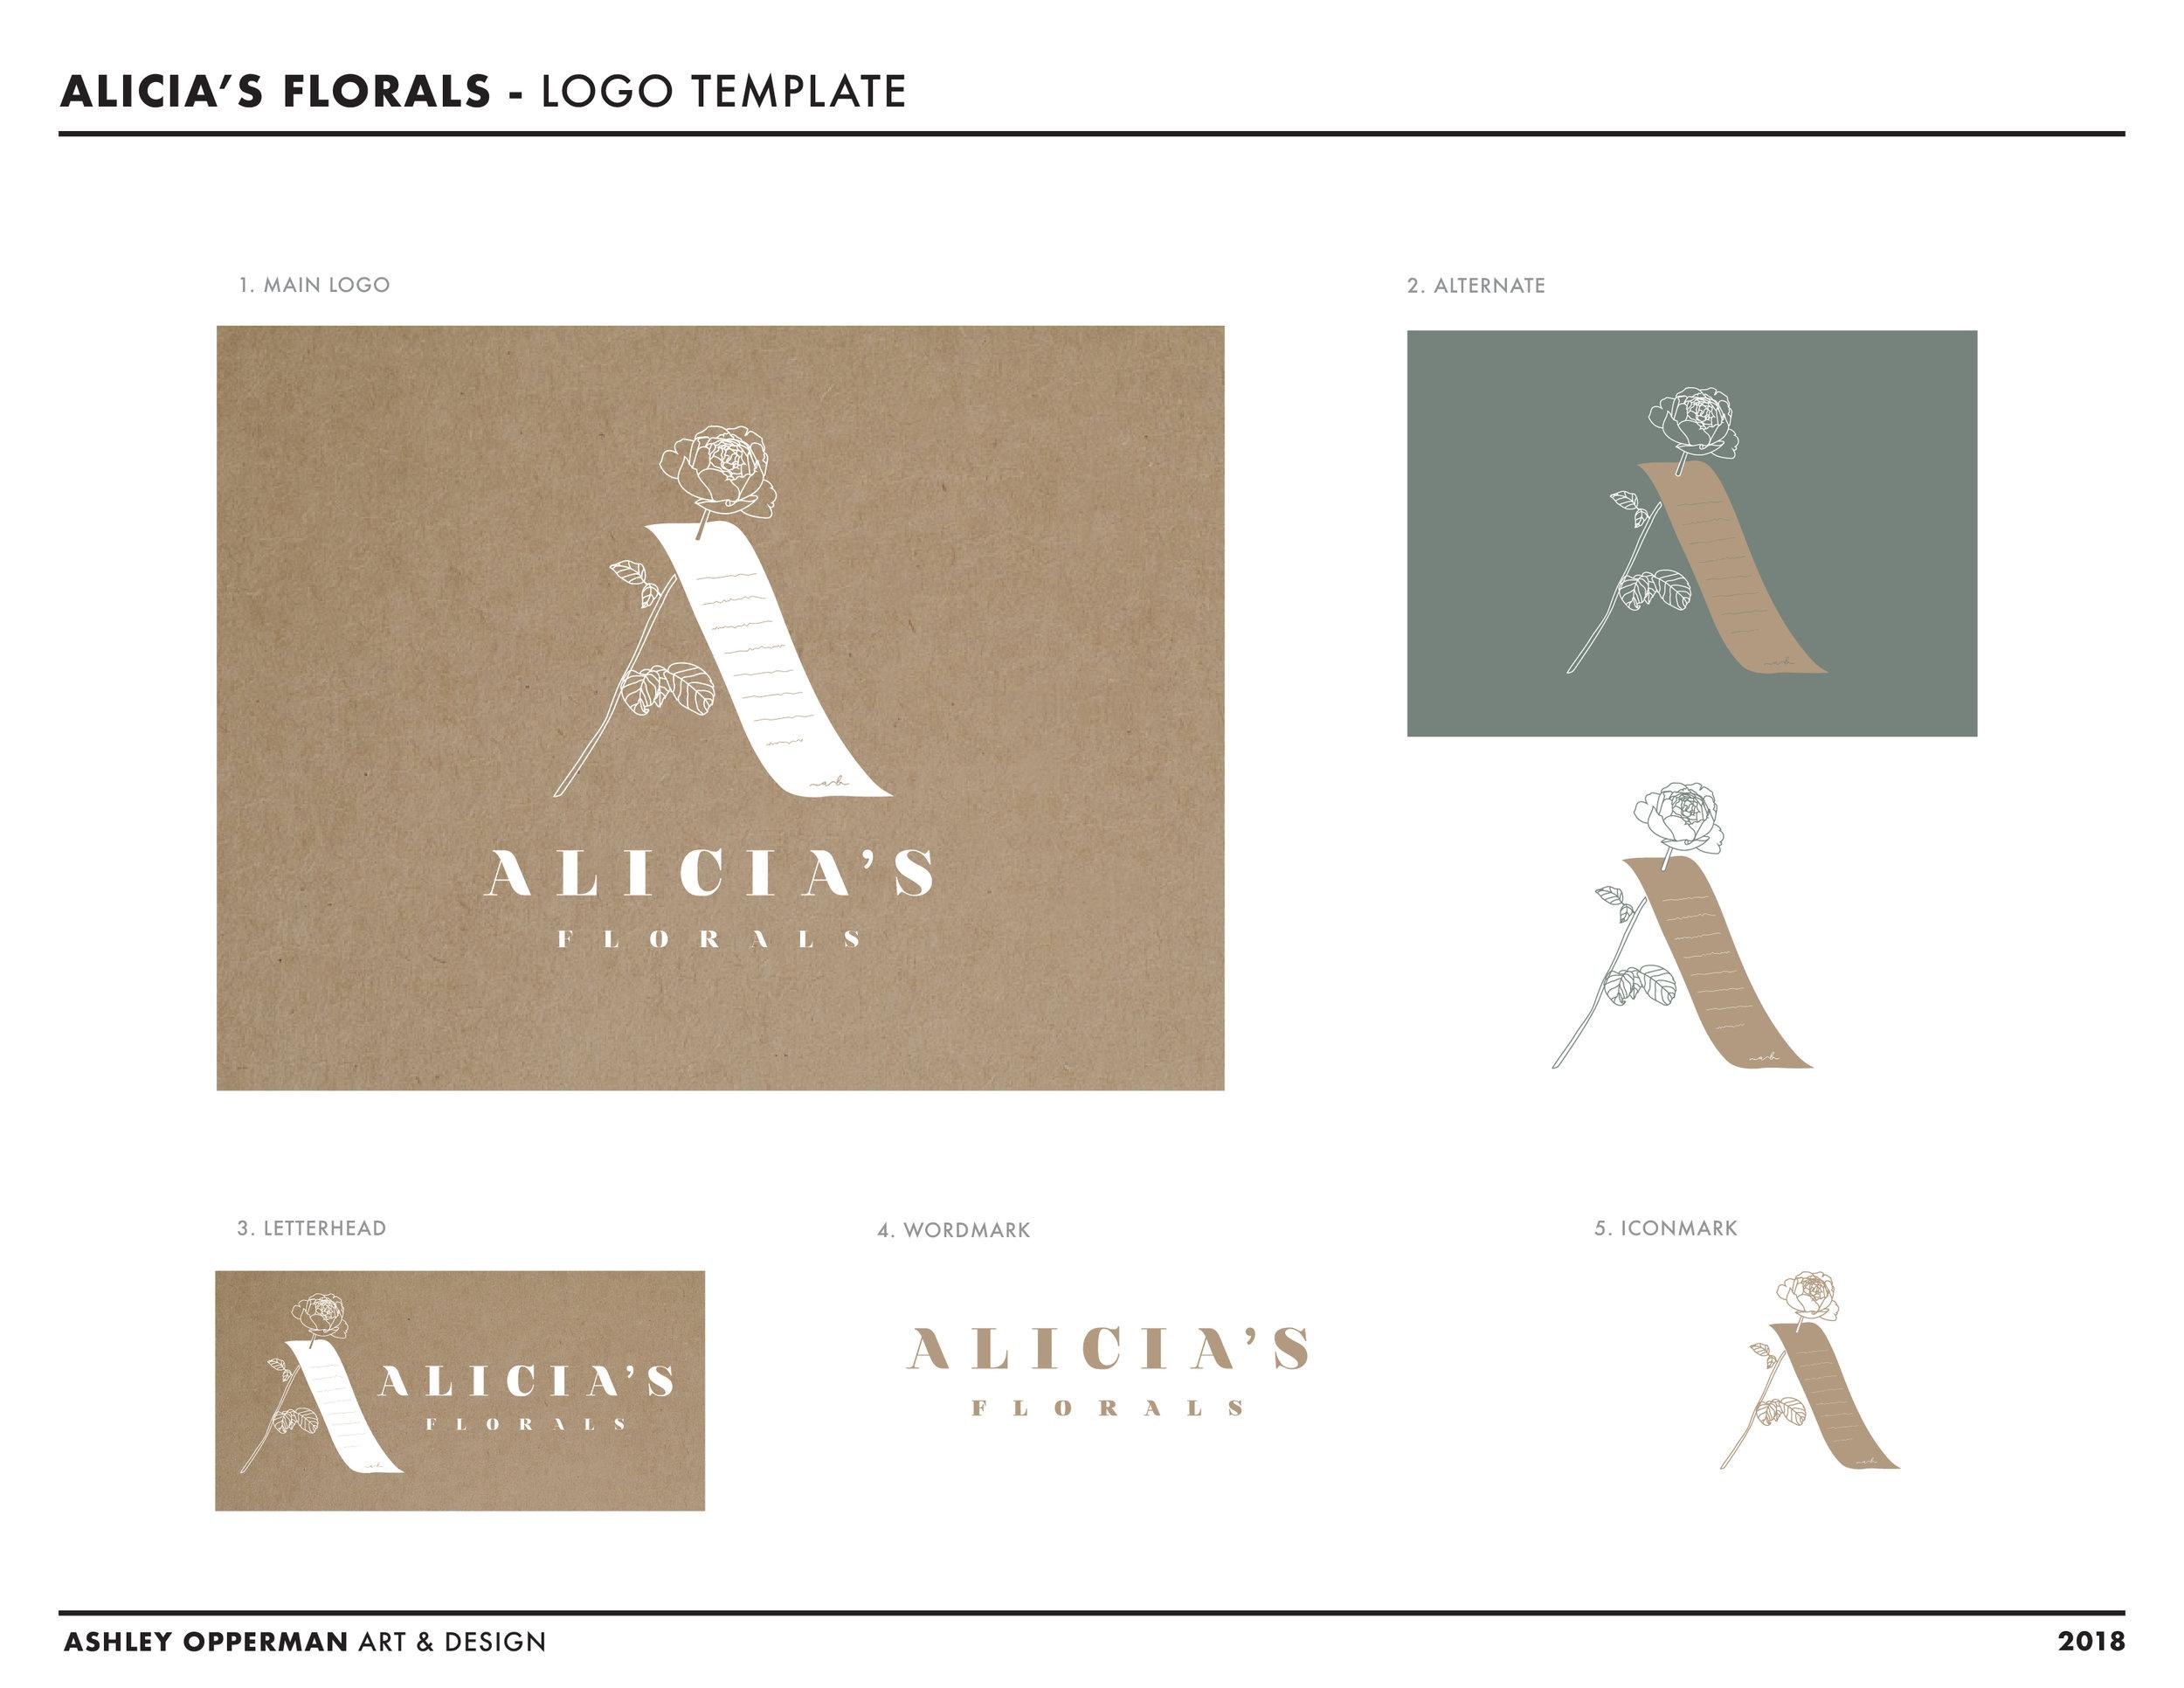 ALICIA'S_FLORALS-Logo2-template-Oct2018-01.jpg